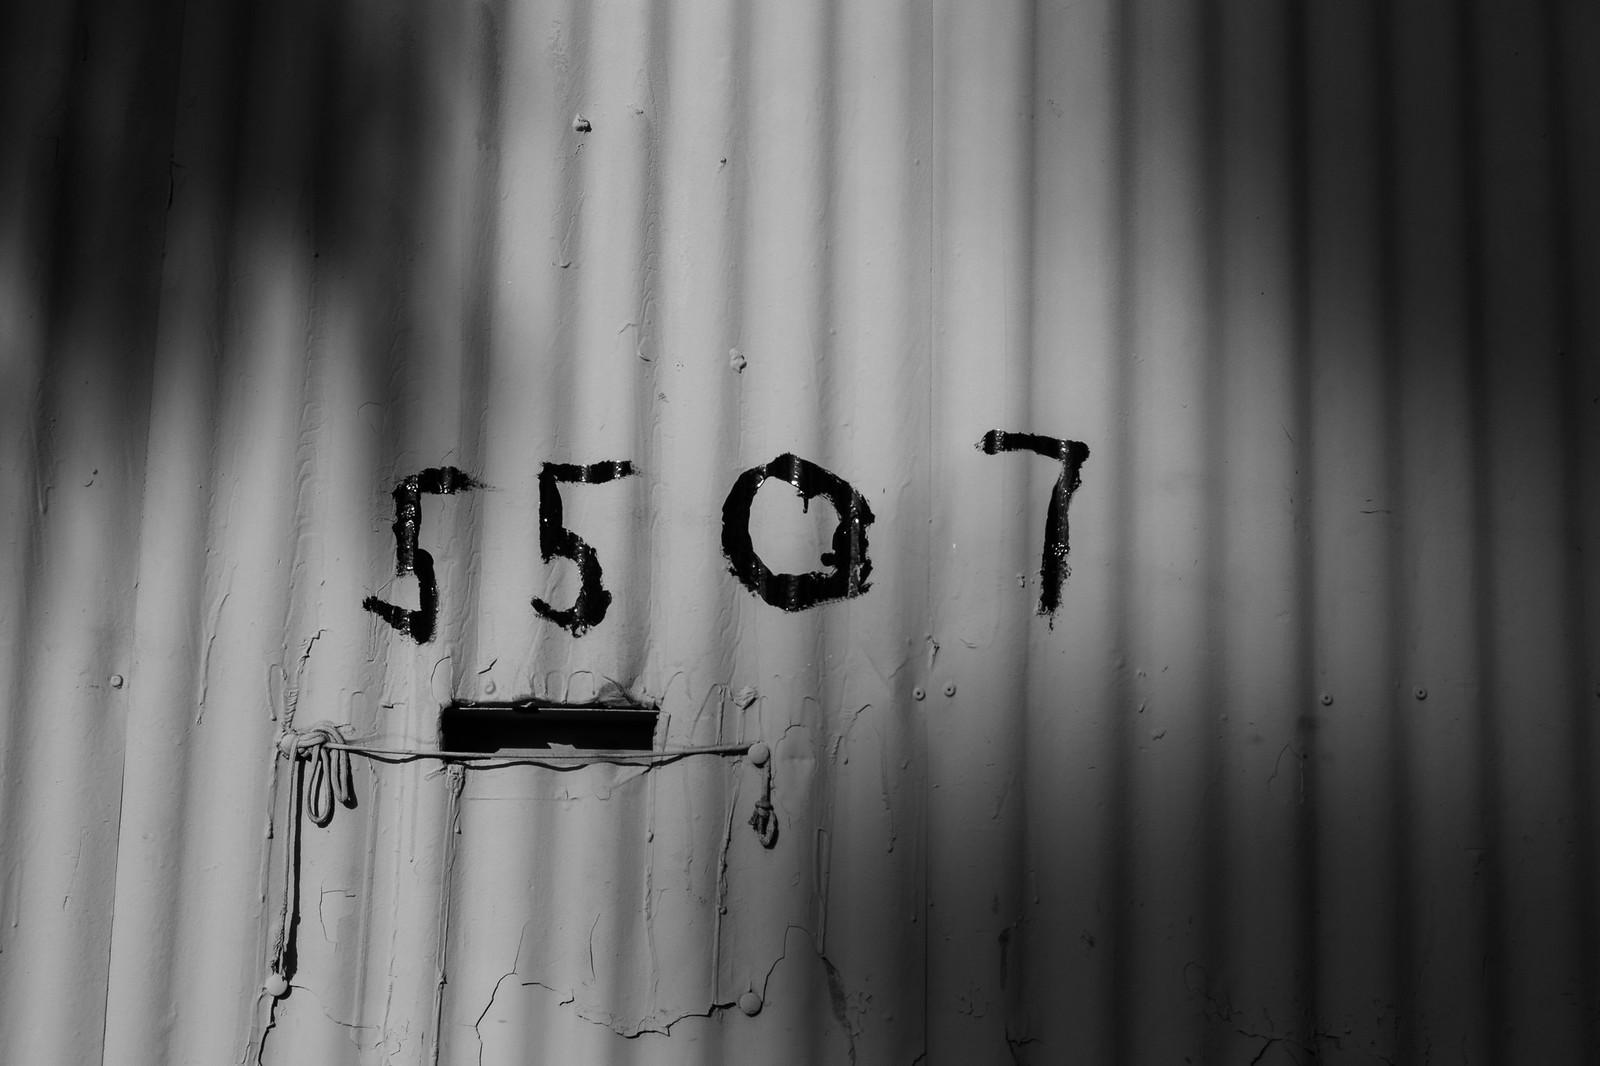 5507 | by michaelj1998